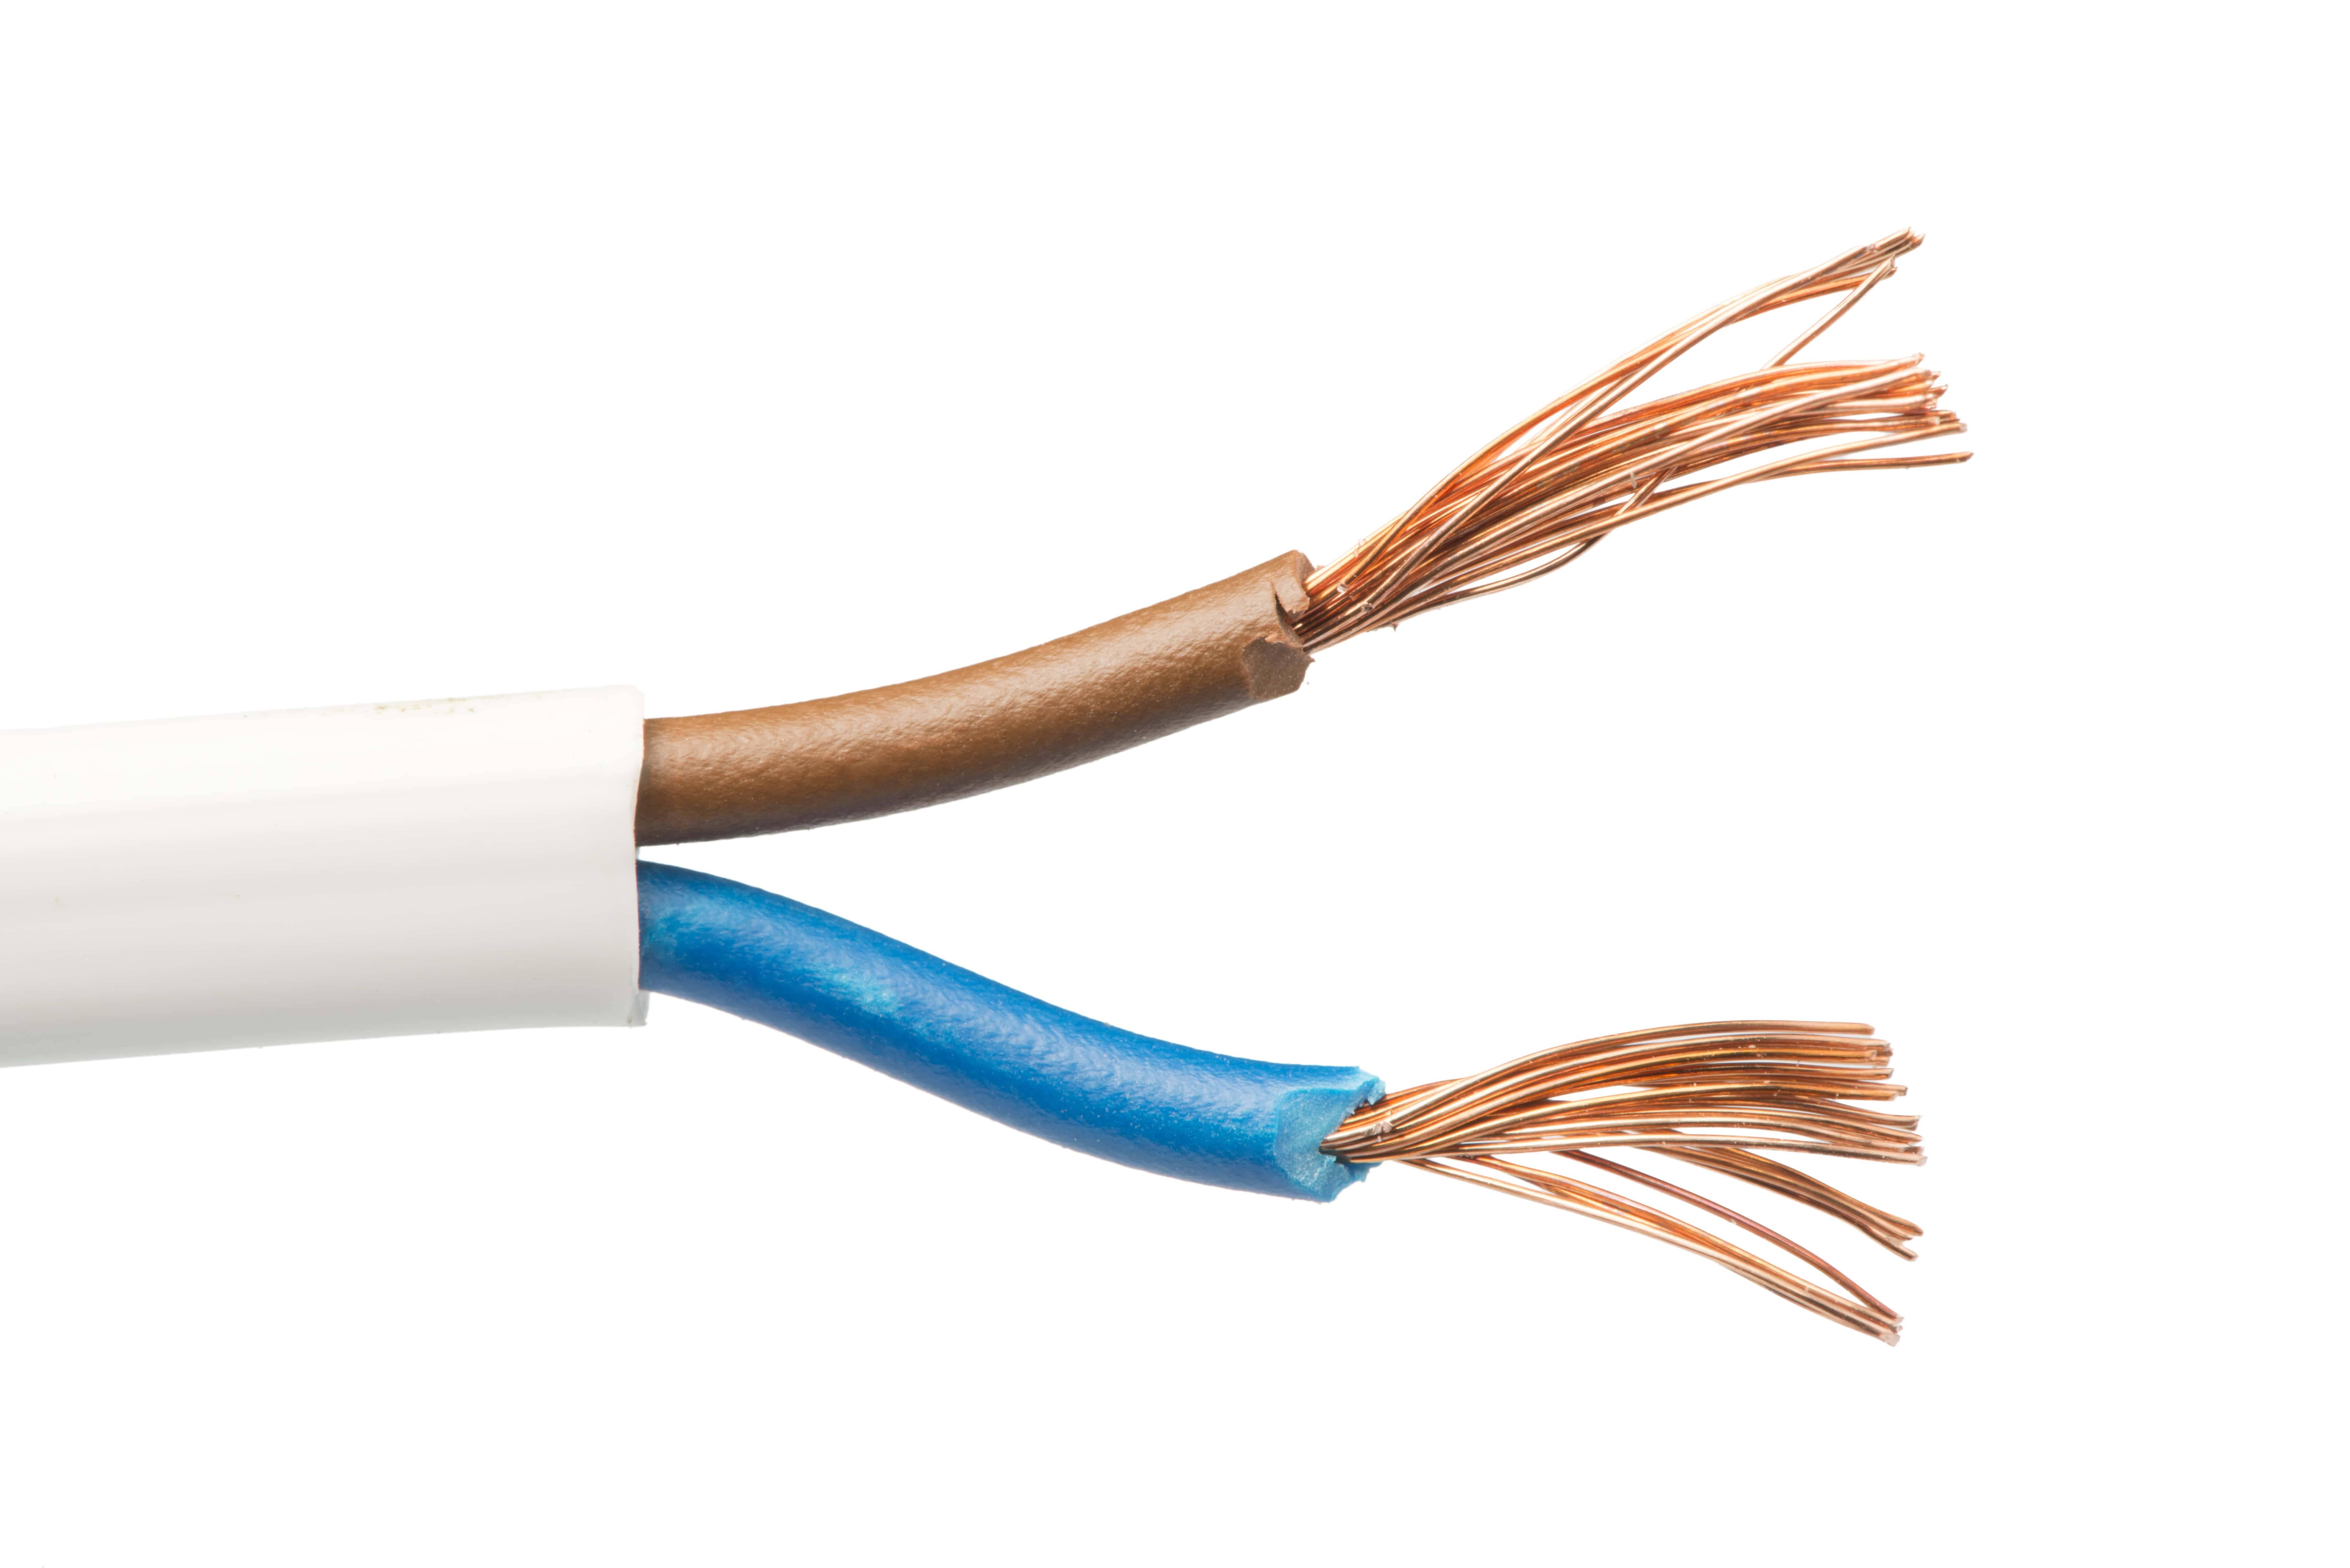 Copper Wiring (Copper Conductor Strands)